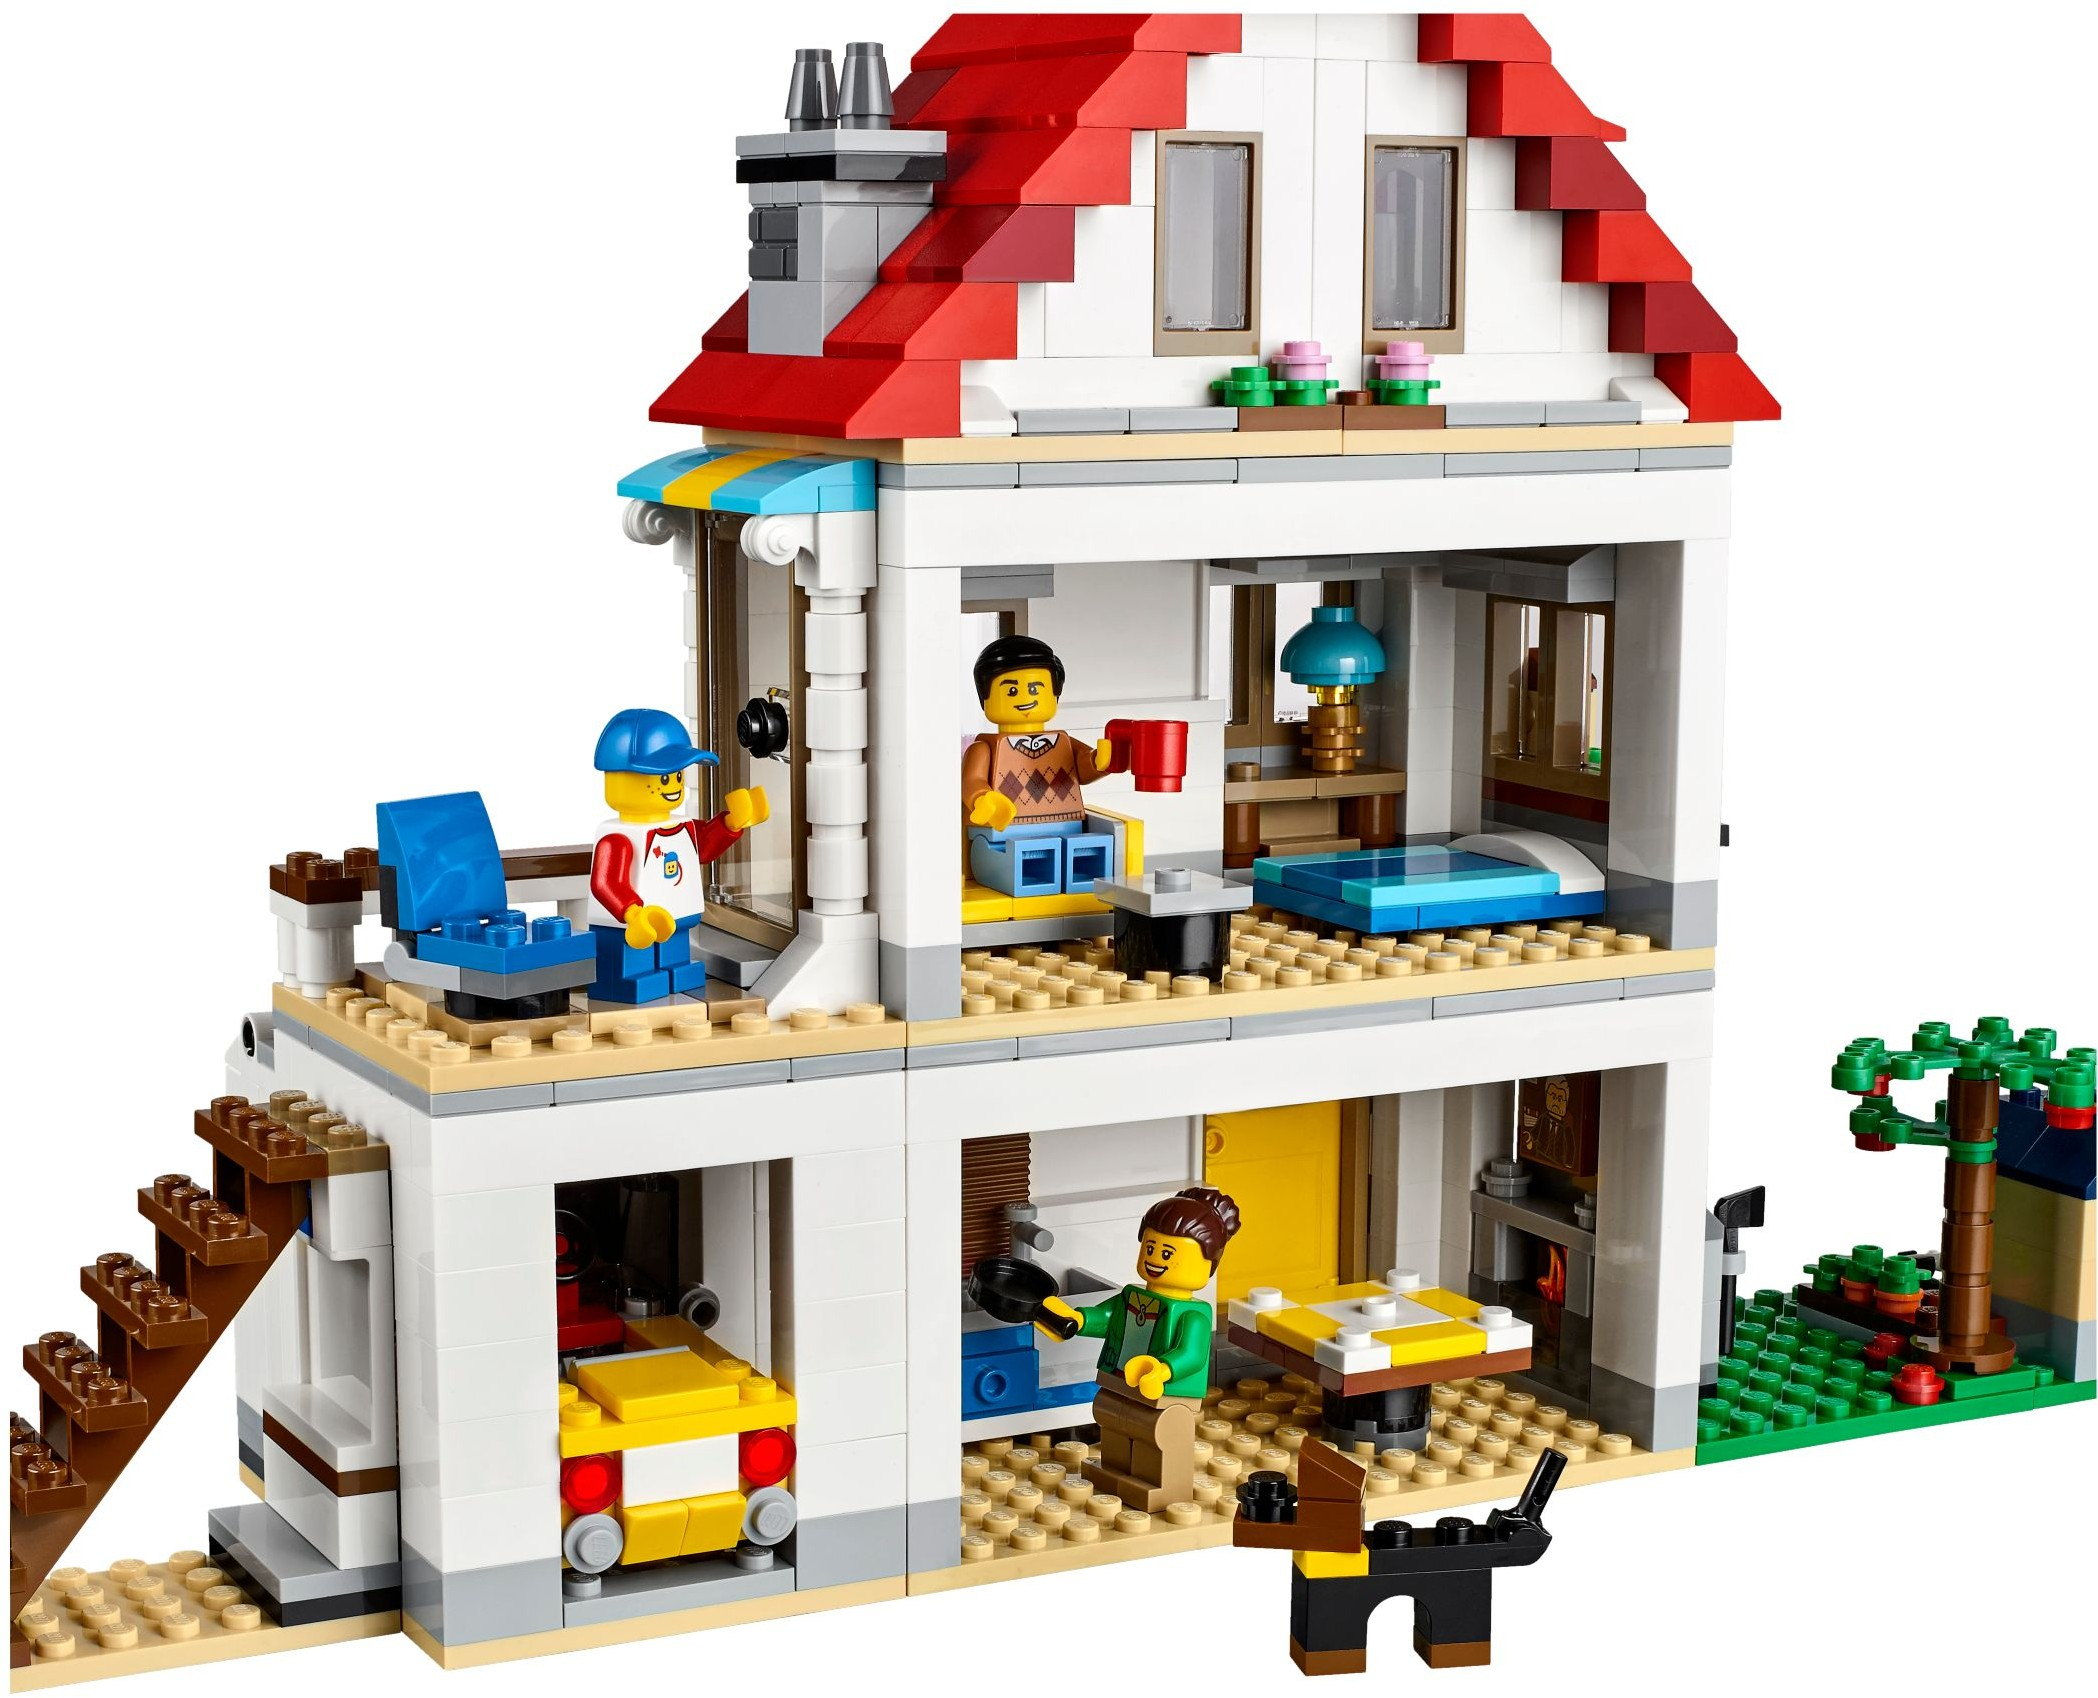 Subito Disponibili Lego Creator Modular System 31067